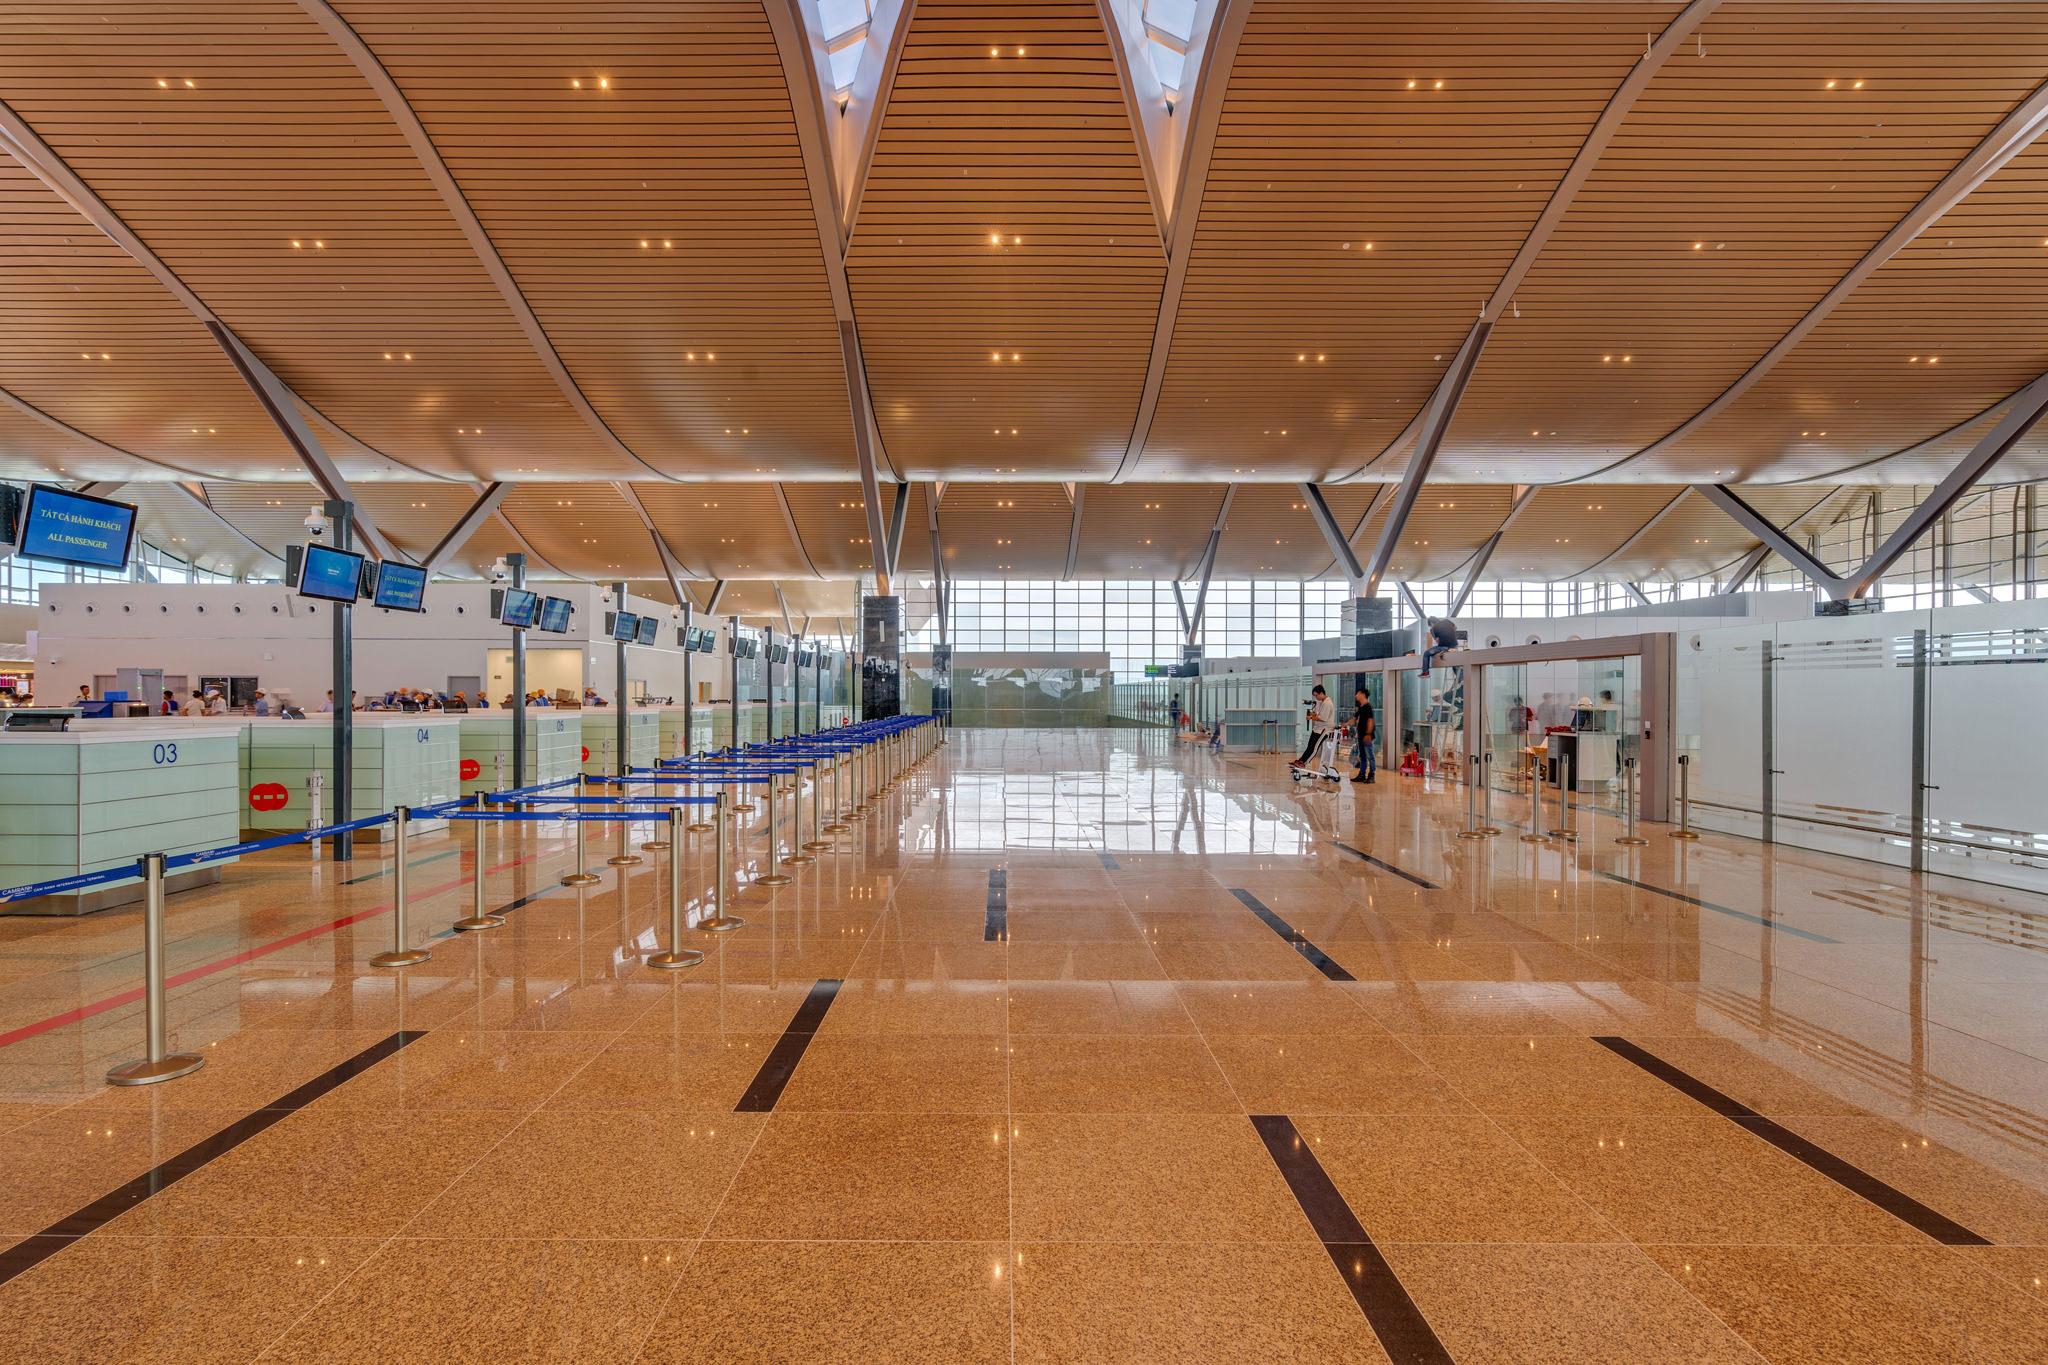 20180626 - Cam Ranh Airport - Architecture - 0331.jpg